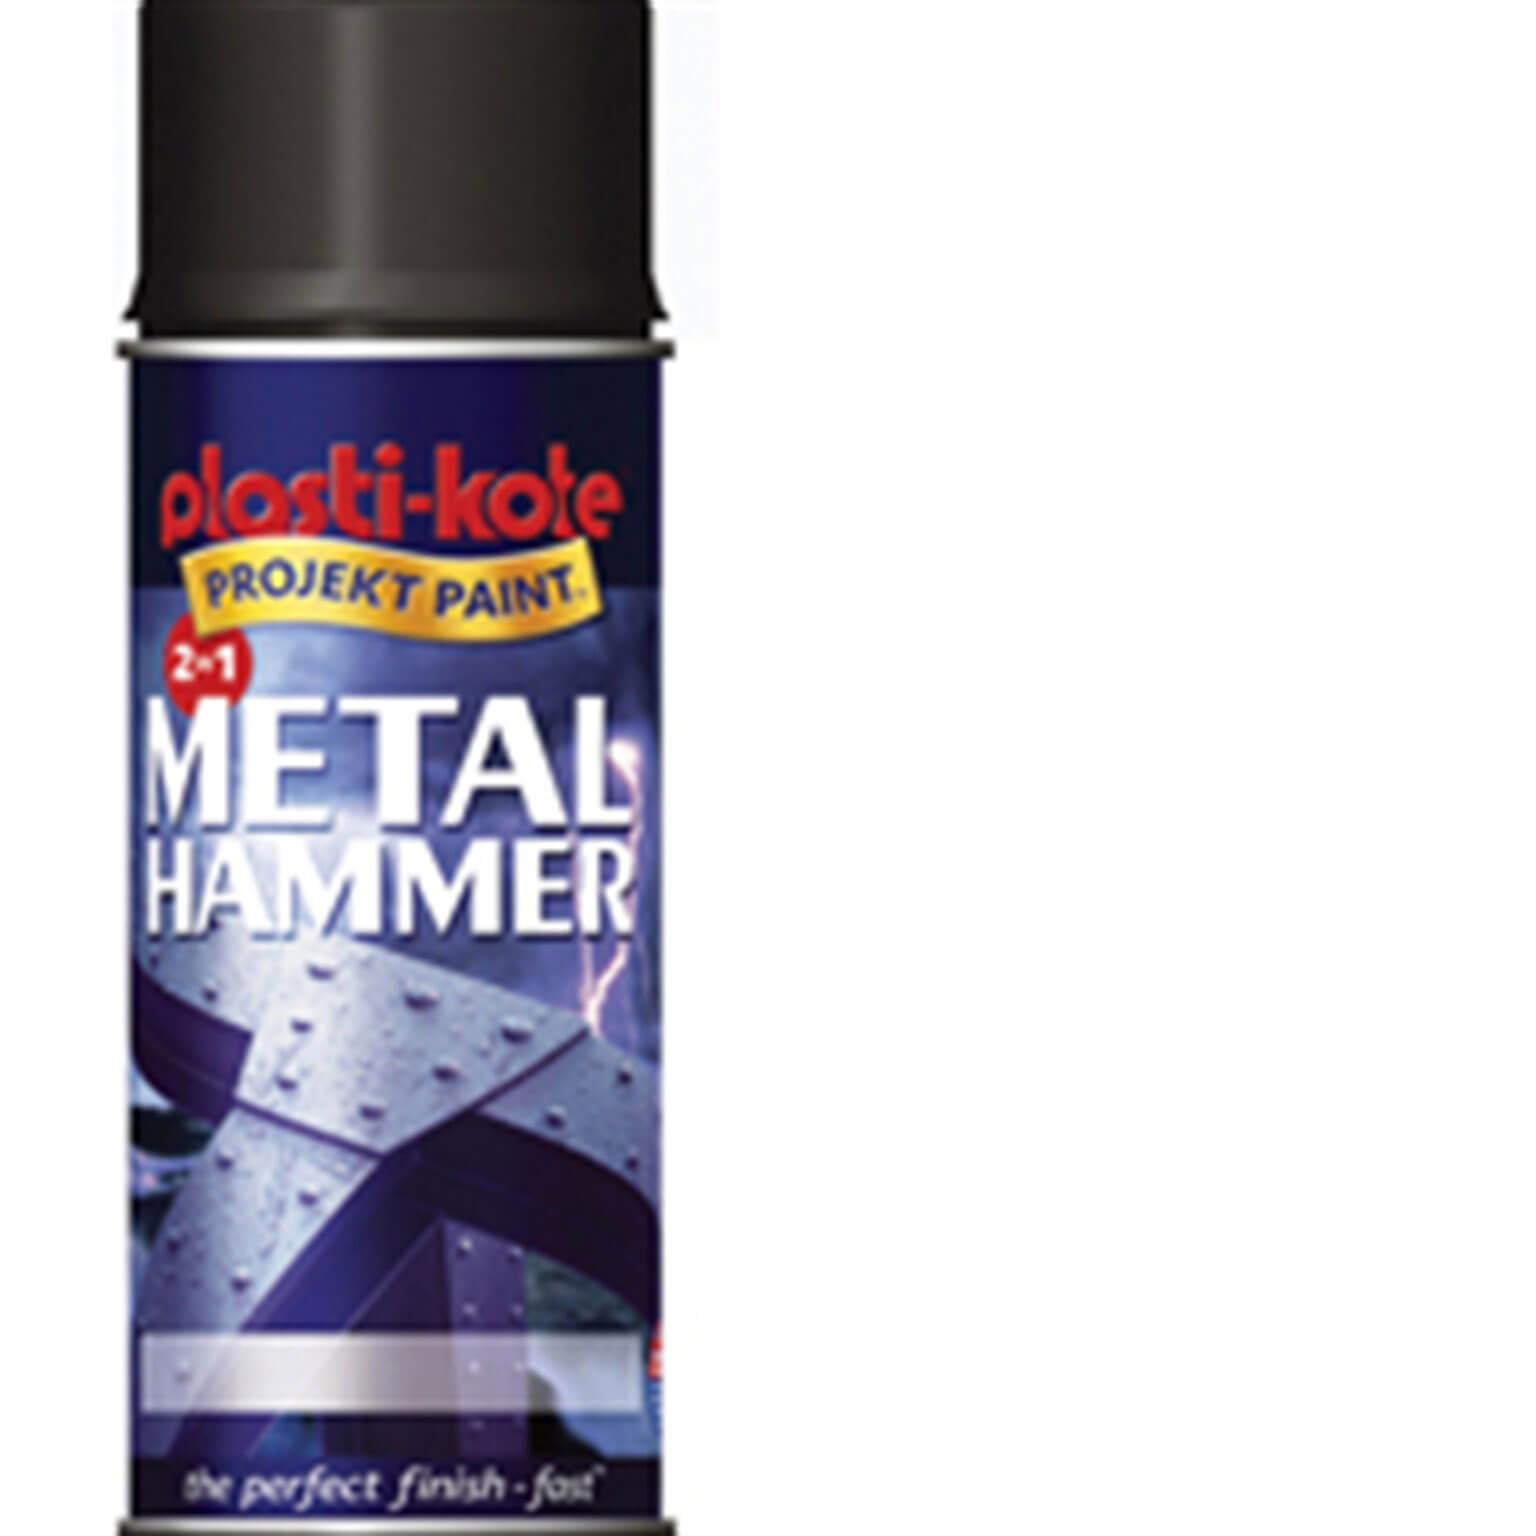 Image of Plastikote Metal Paint Hammer Aerosol Spray Paint Silver 400ml